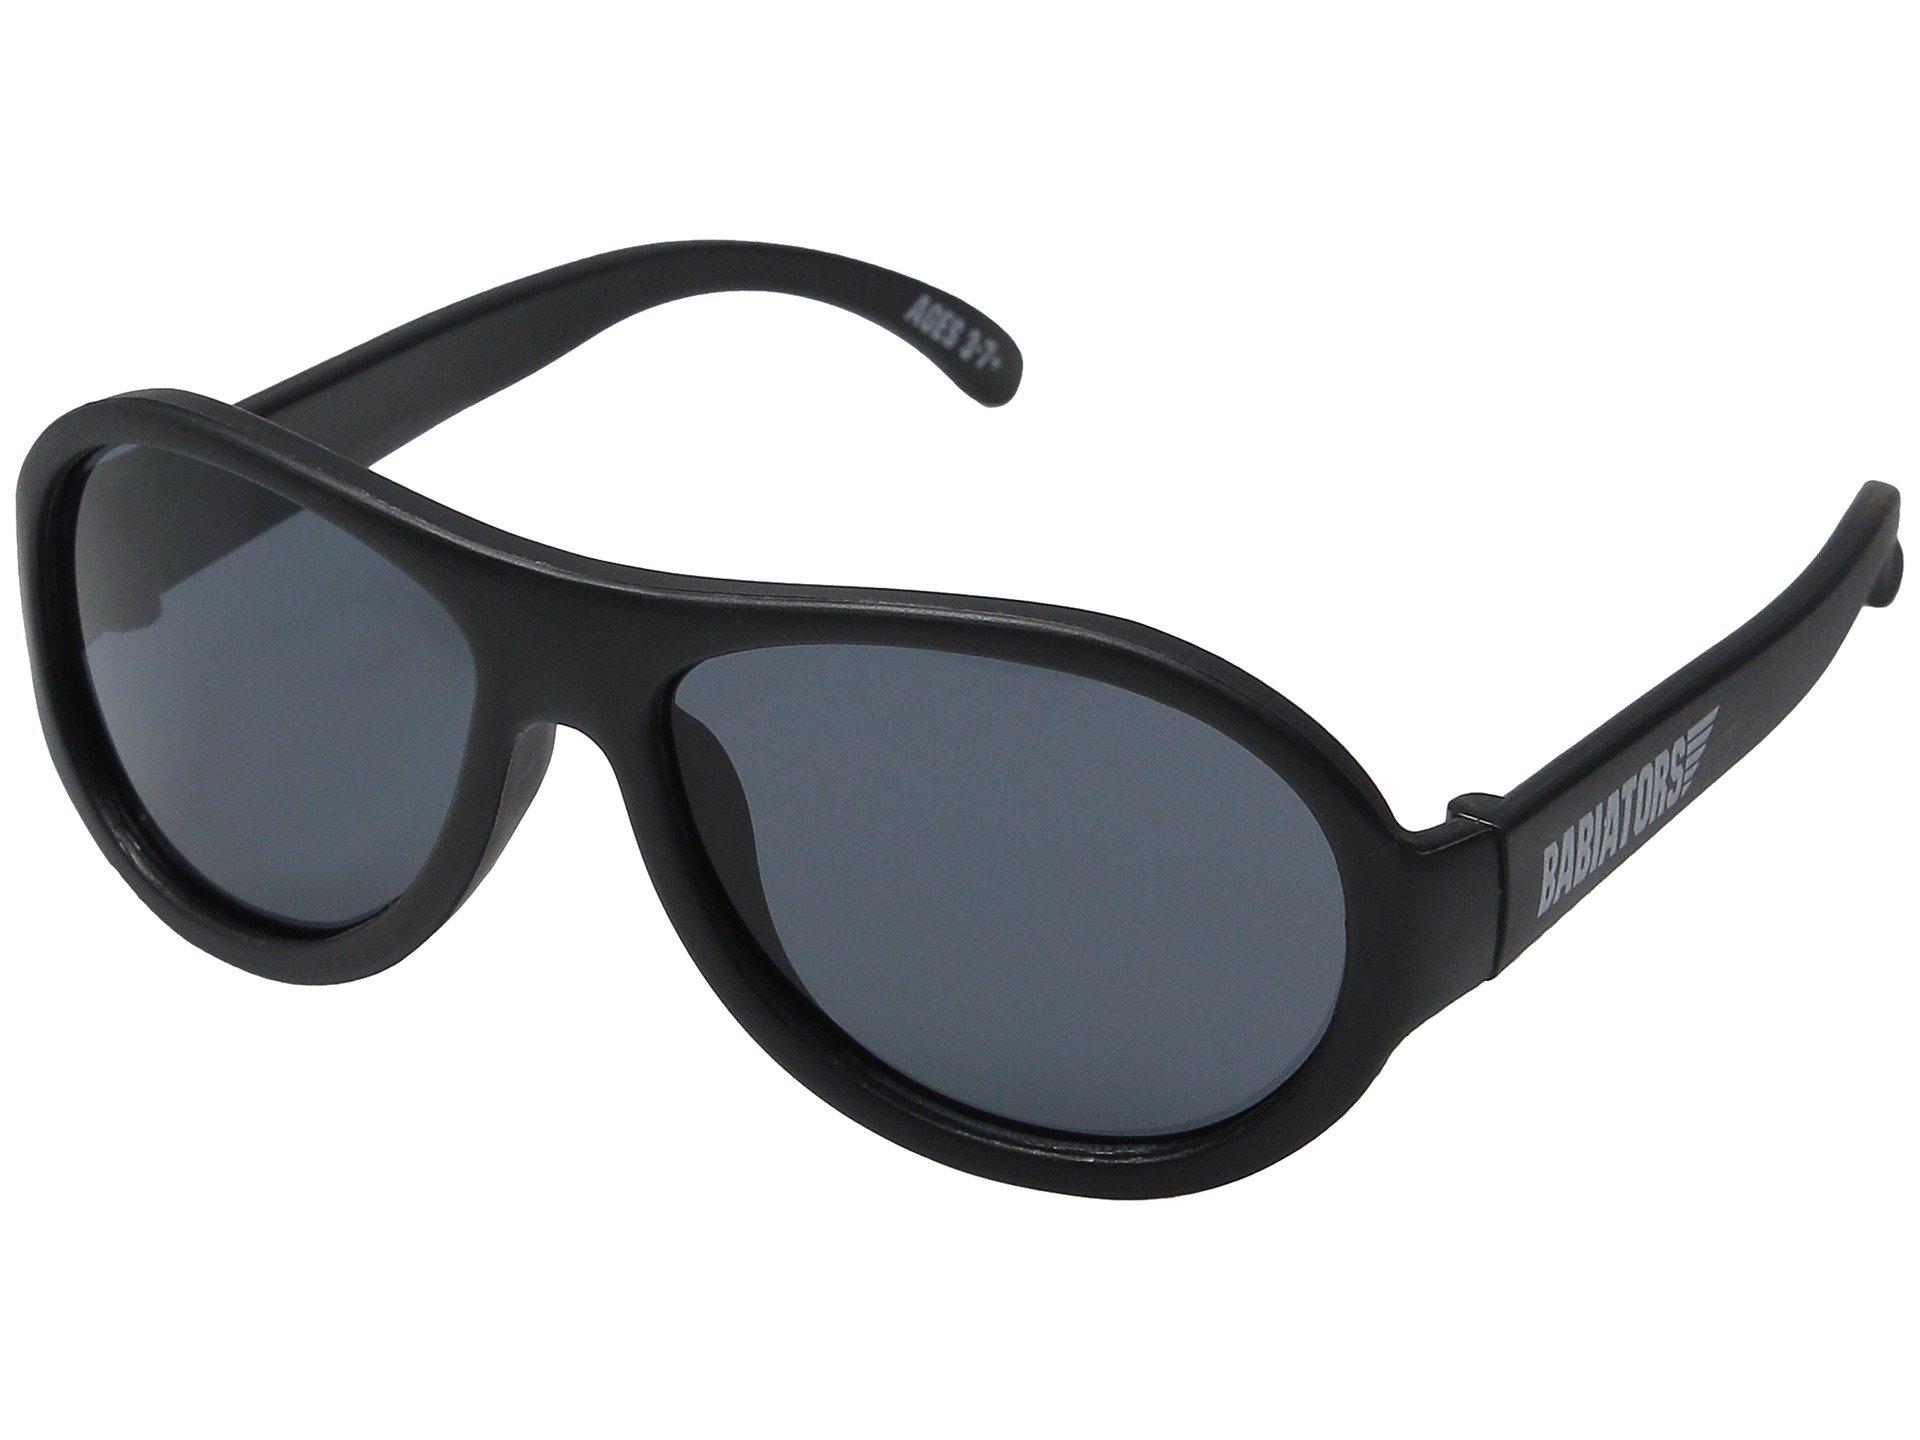 Babiators - Original Aviator Kids Sunglasses - Black Ops Black (3-5 years)